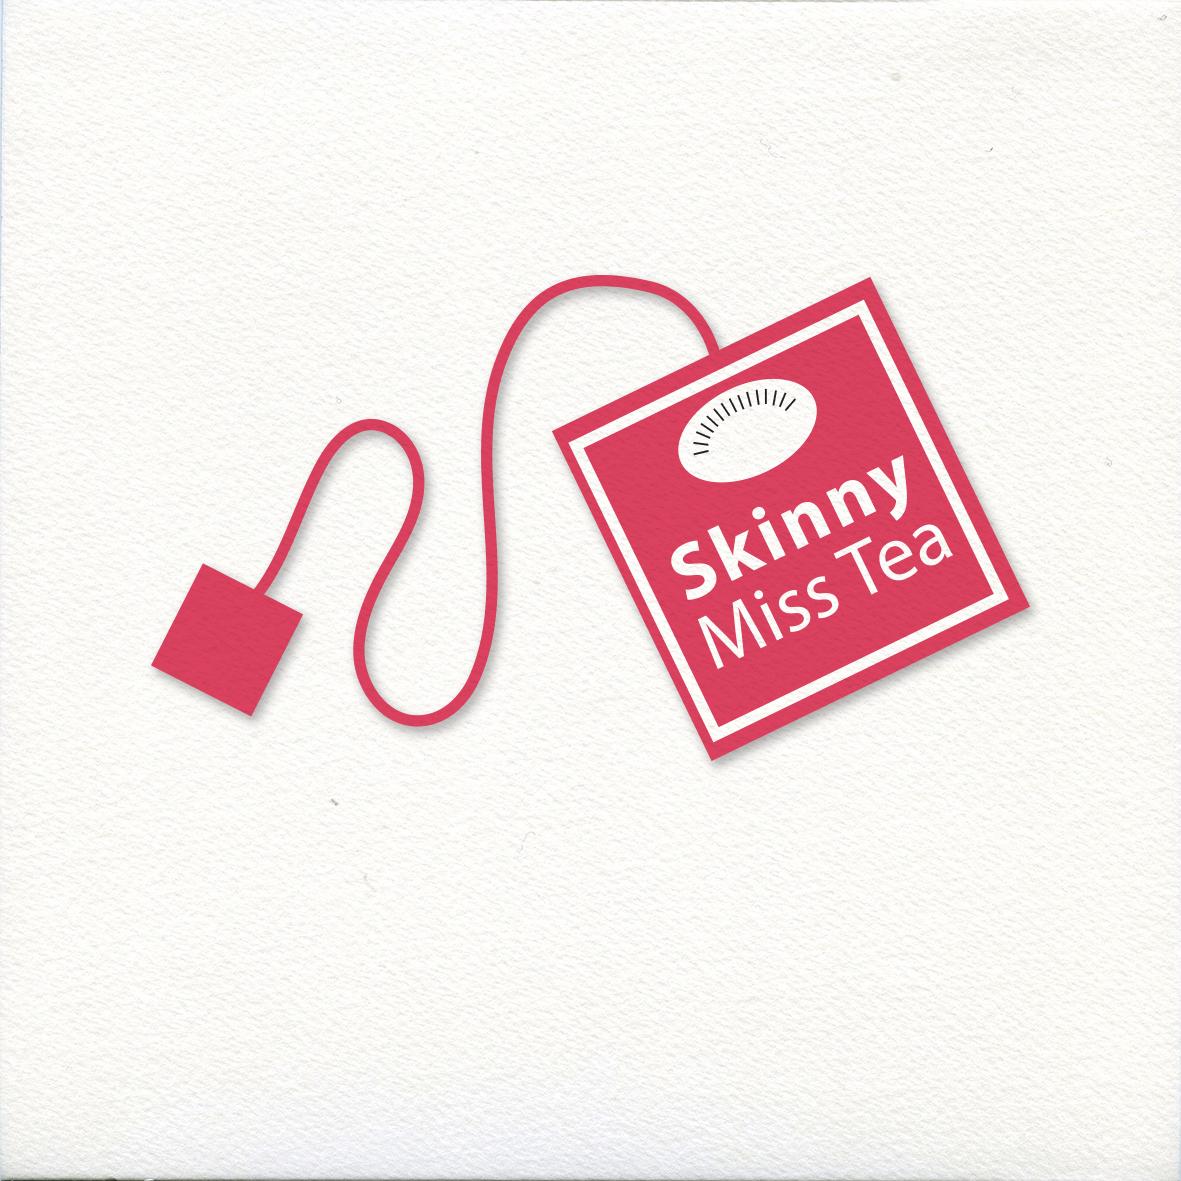 skinny Tea logo